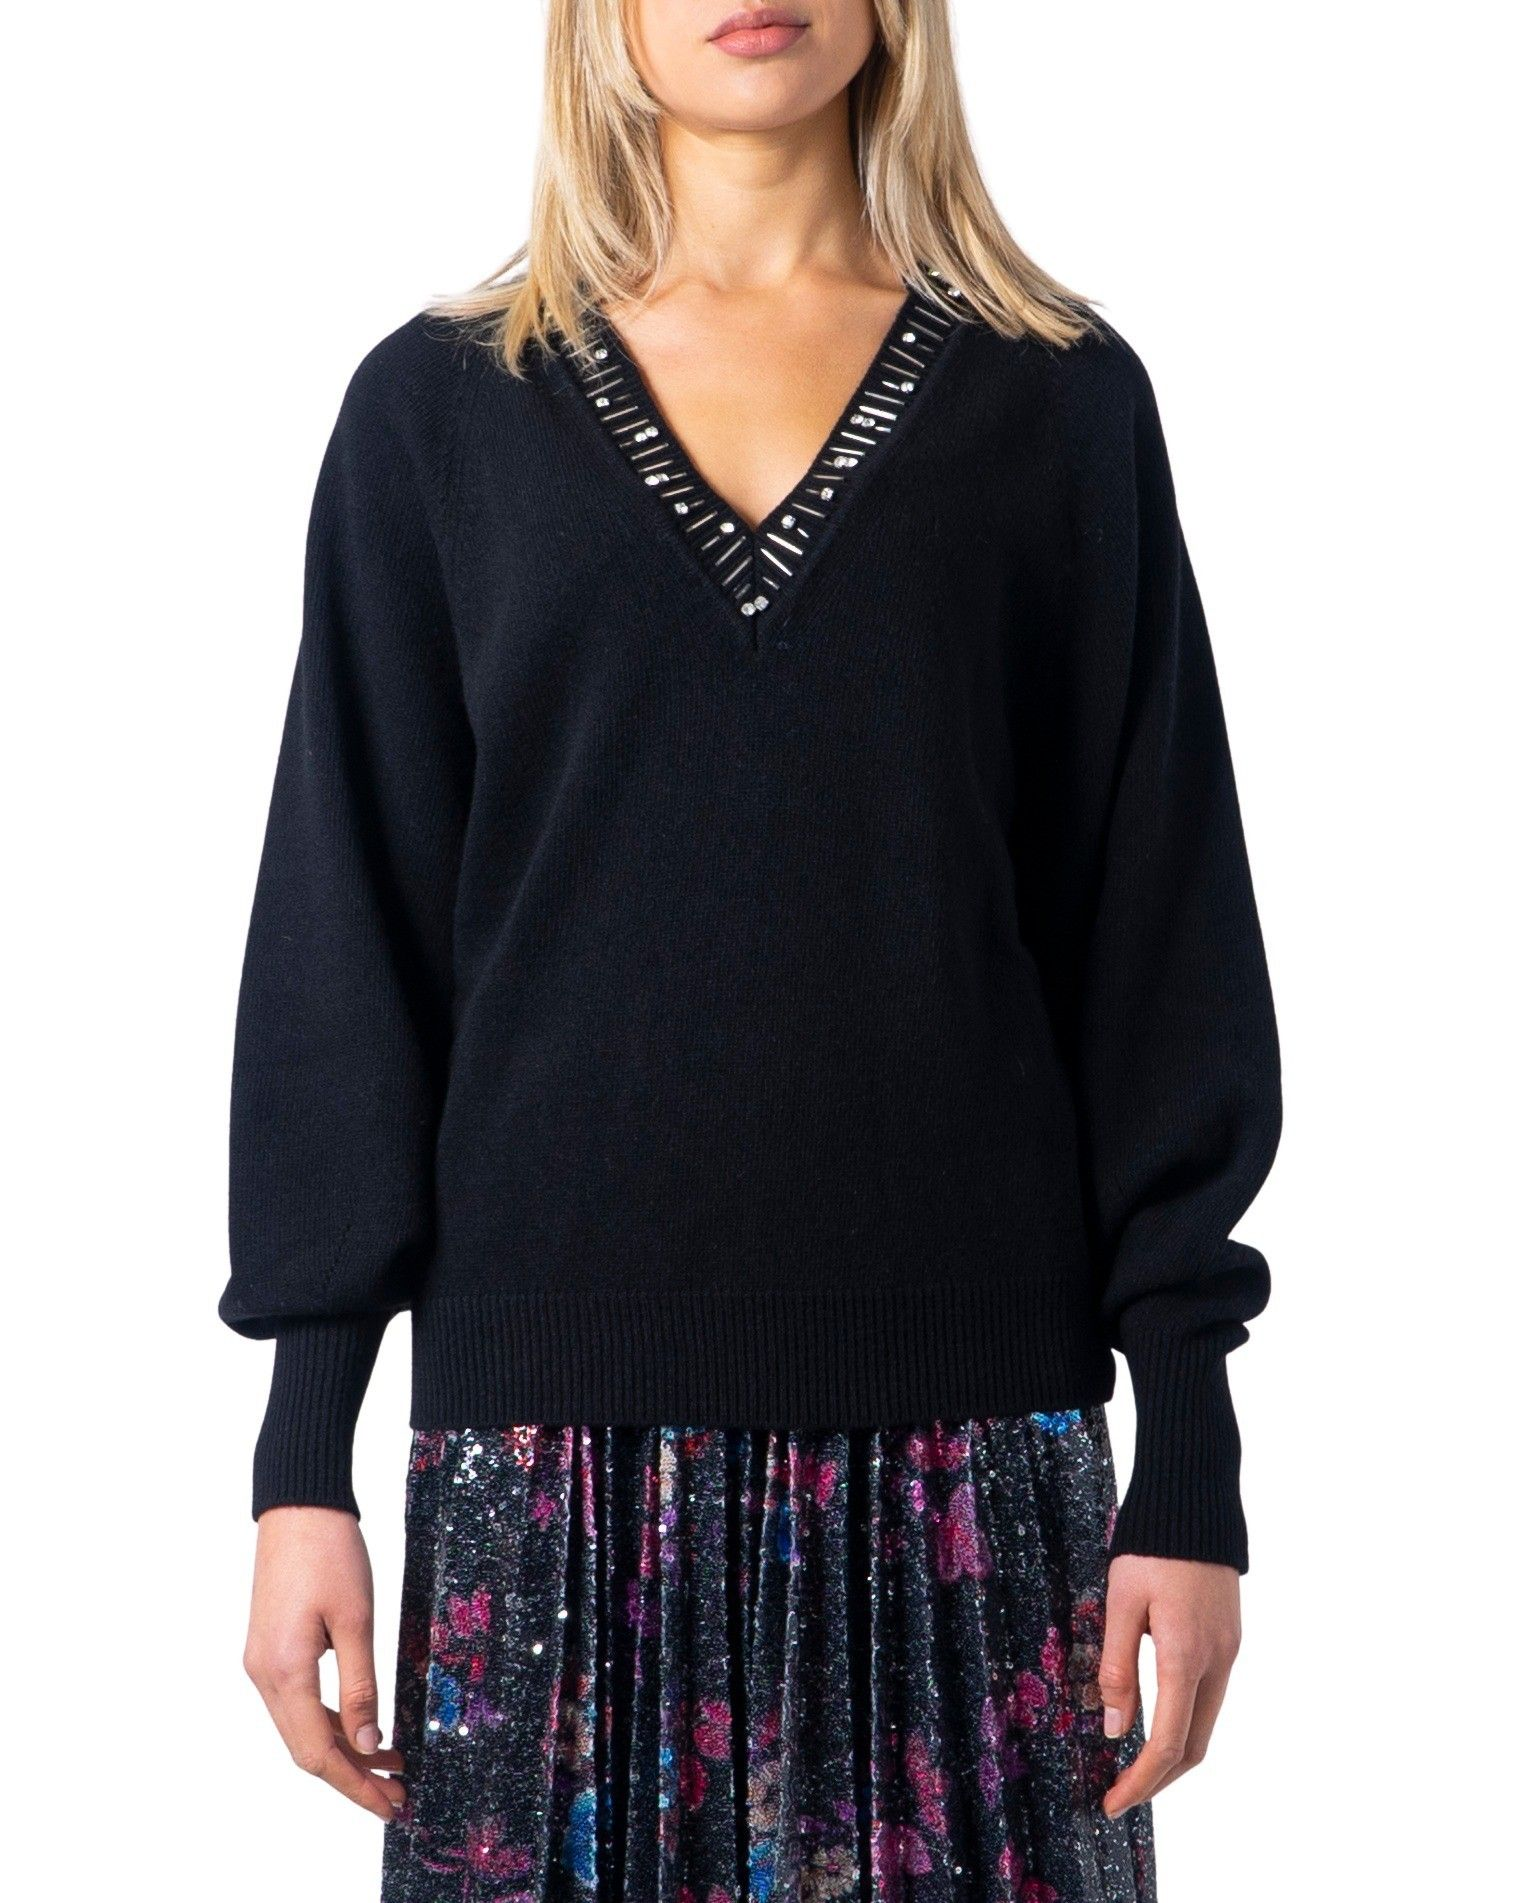 Pinko Women's Sweatshirt In Black